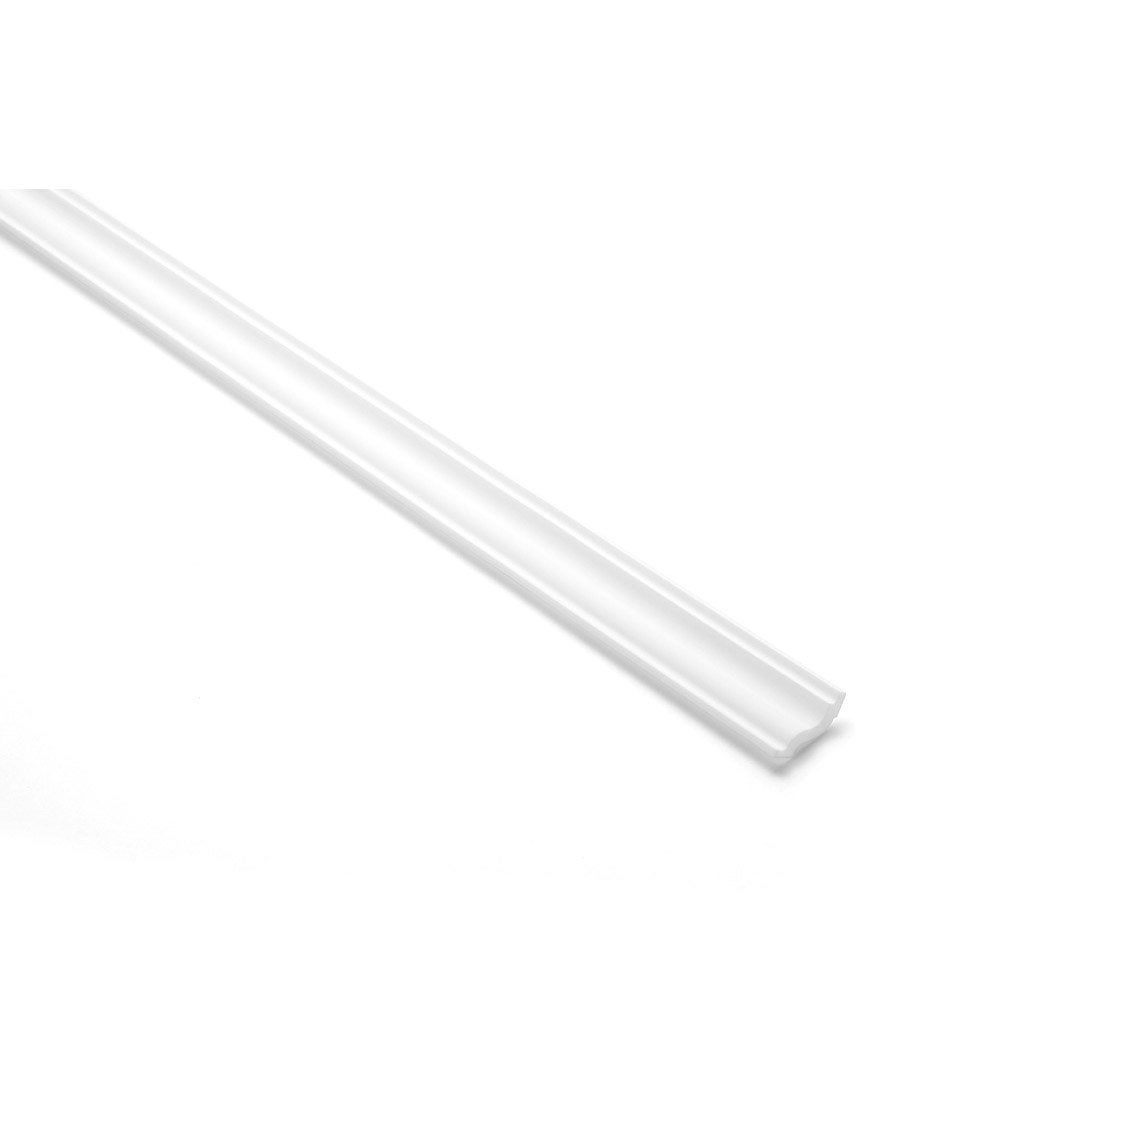 2 moulures de plafond d071 polystyr ne extrud 4 x 200 cm leroy merlin. Black Bedroom Furniture Sets. Home Design Ideas